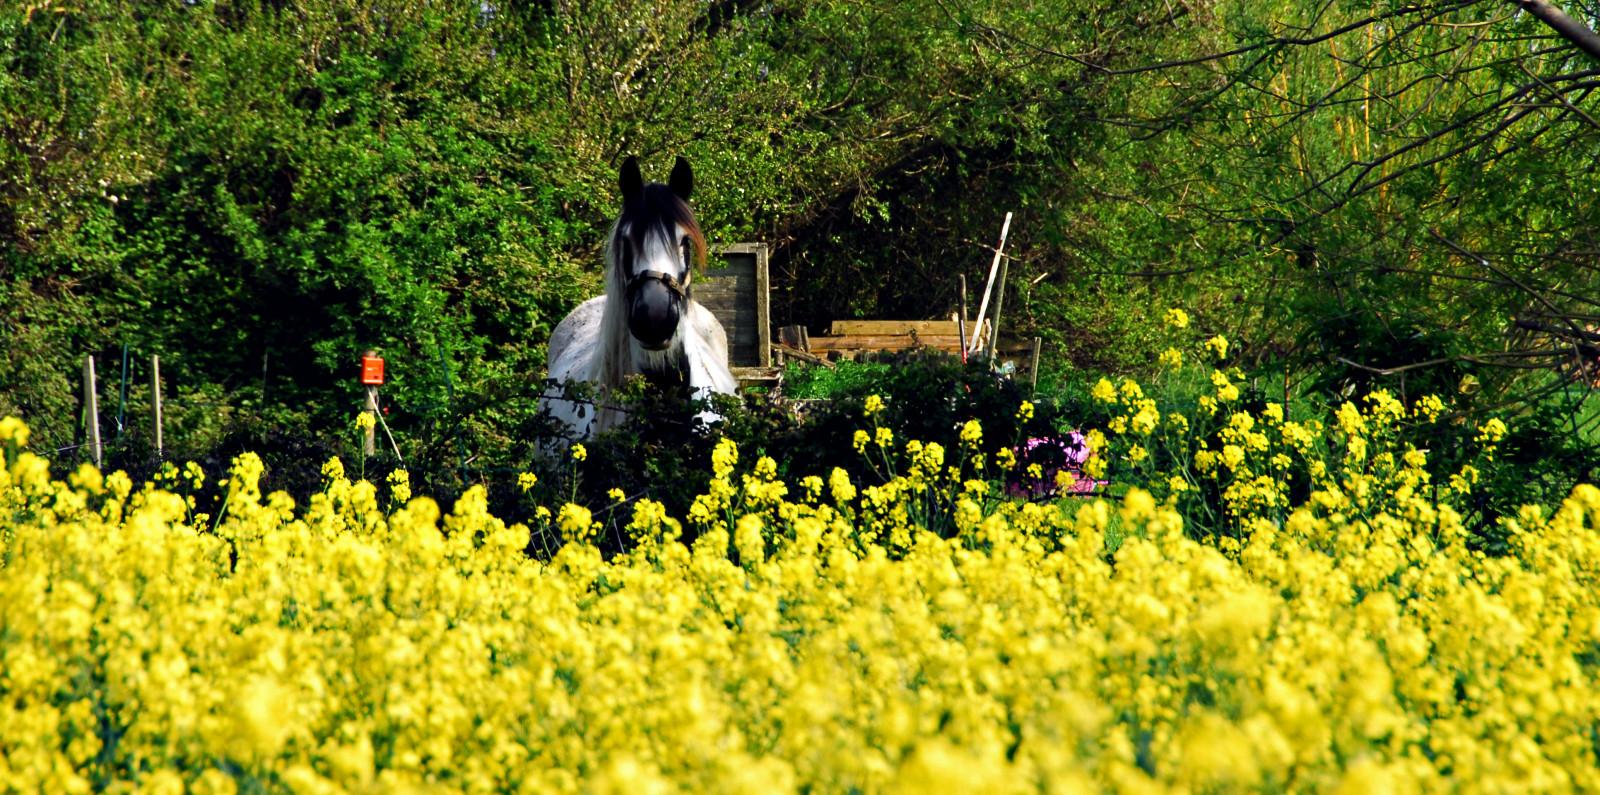 hintergrundbilder landschaft garten pferd gras feld gelb tierwelt nikon pflanzen. Black Bedroom Furniture Sets. Home Design Ideas